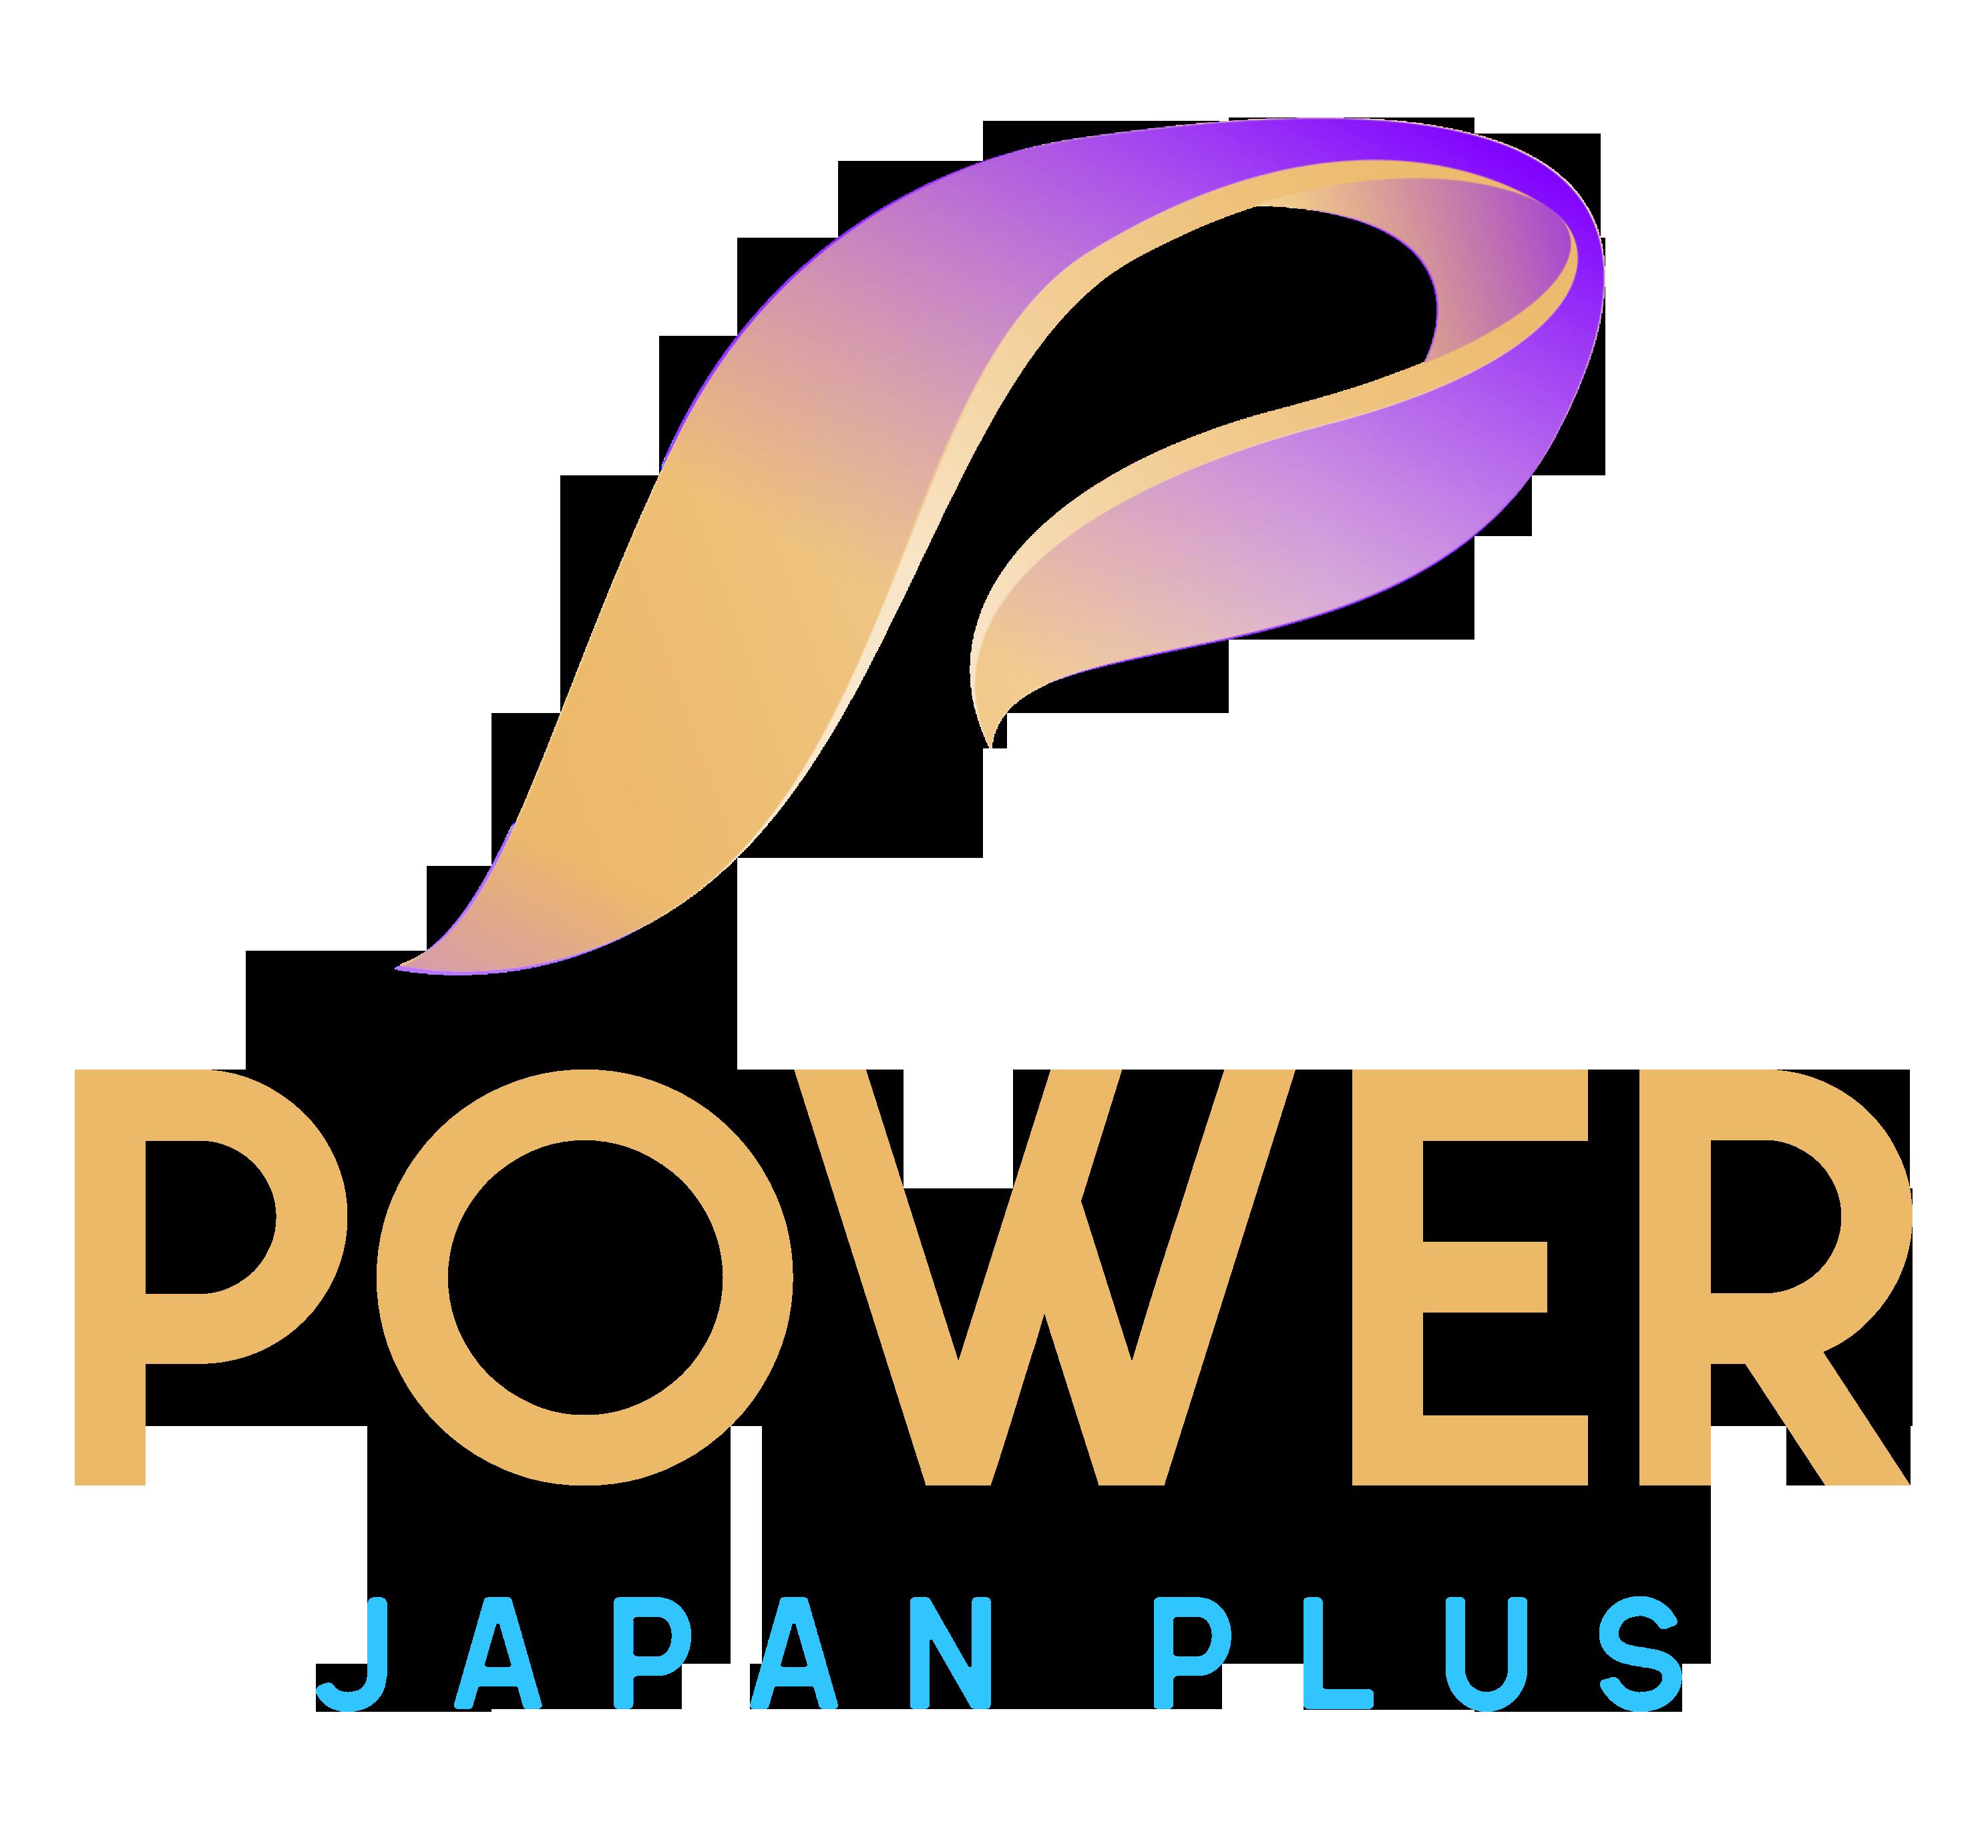 Power Japan Plus